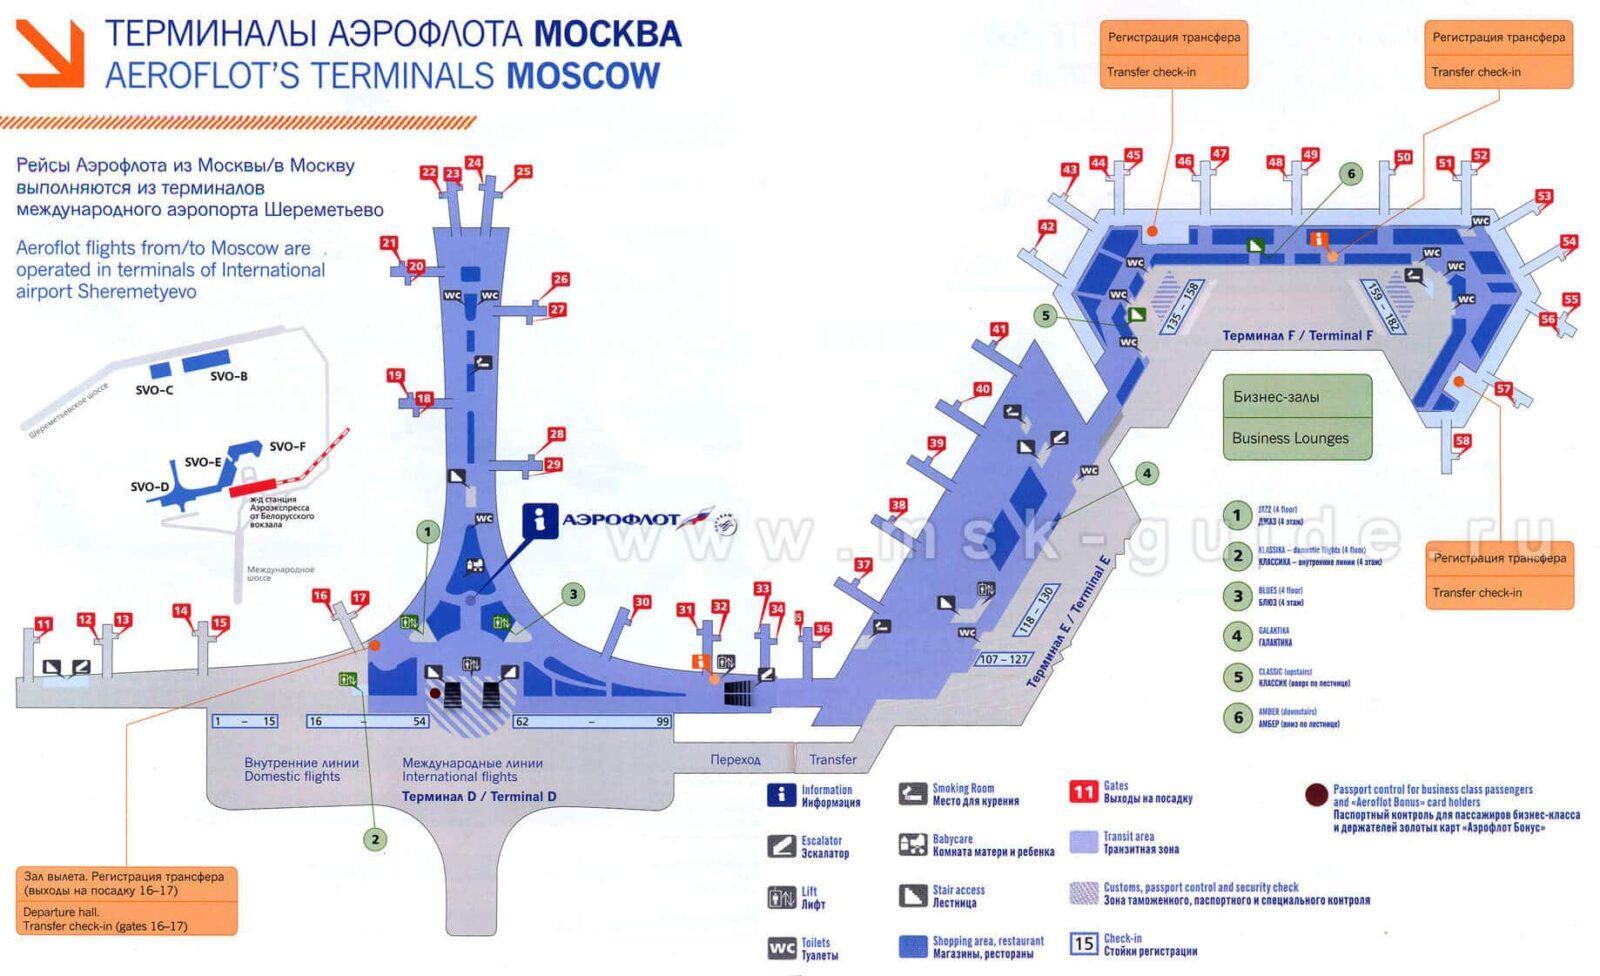 Схема аэрофлота